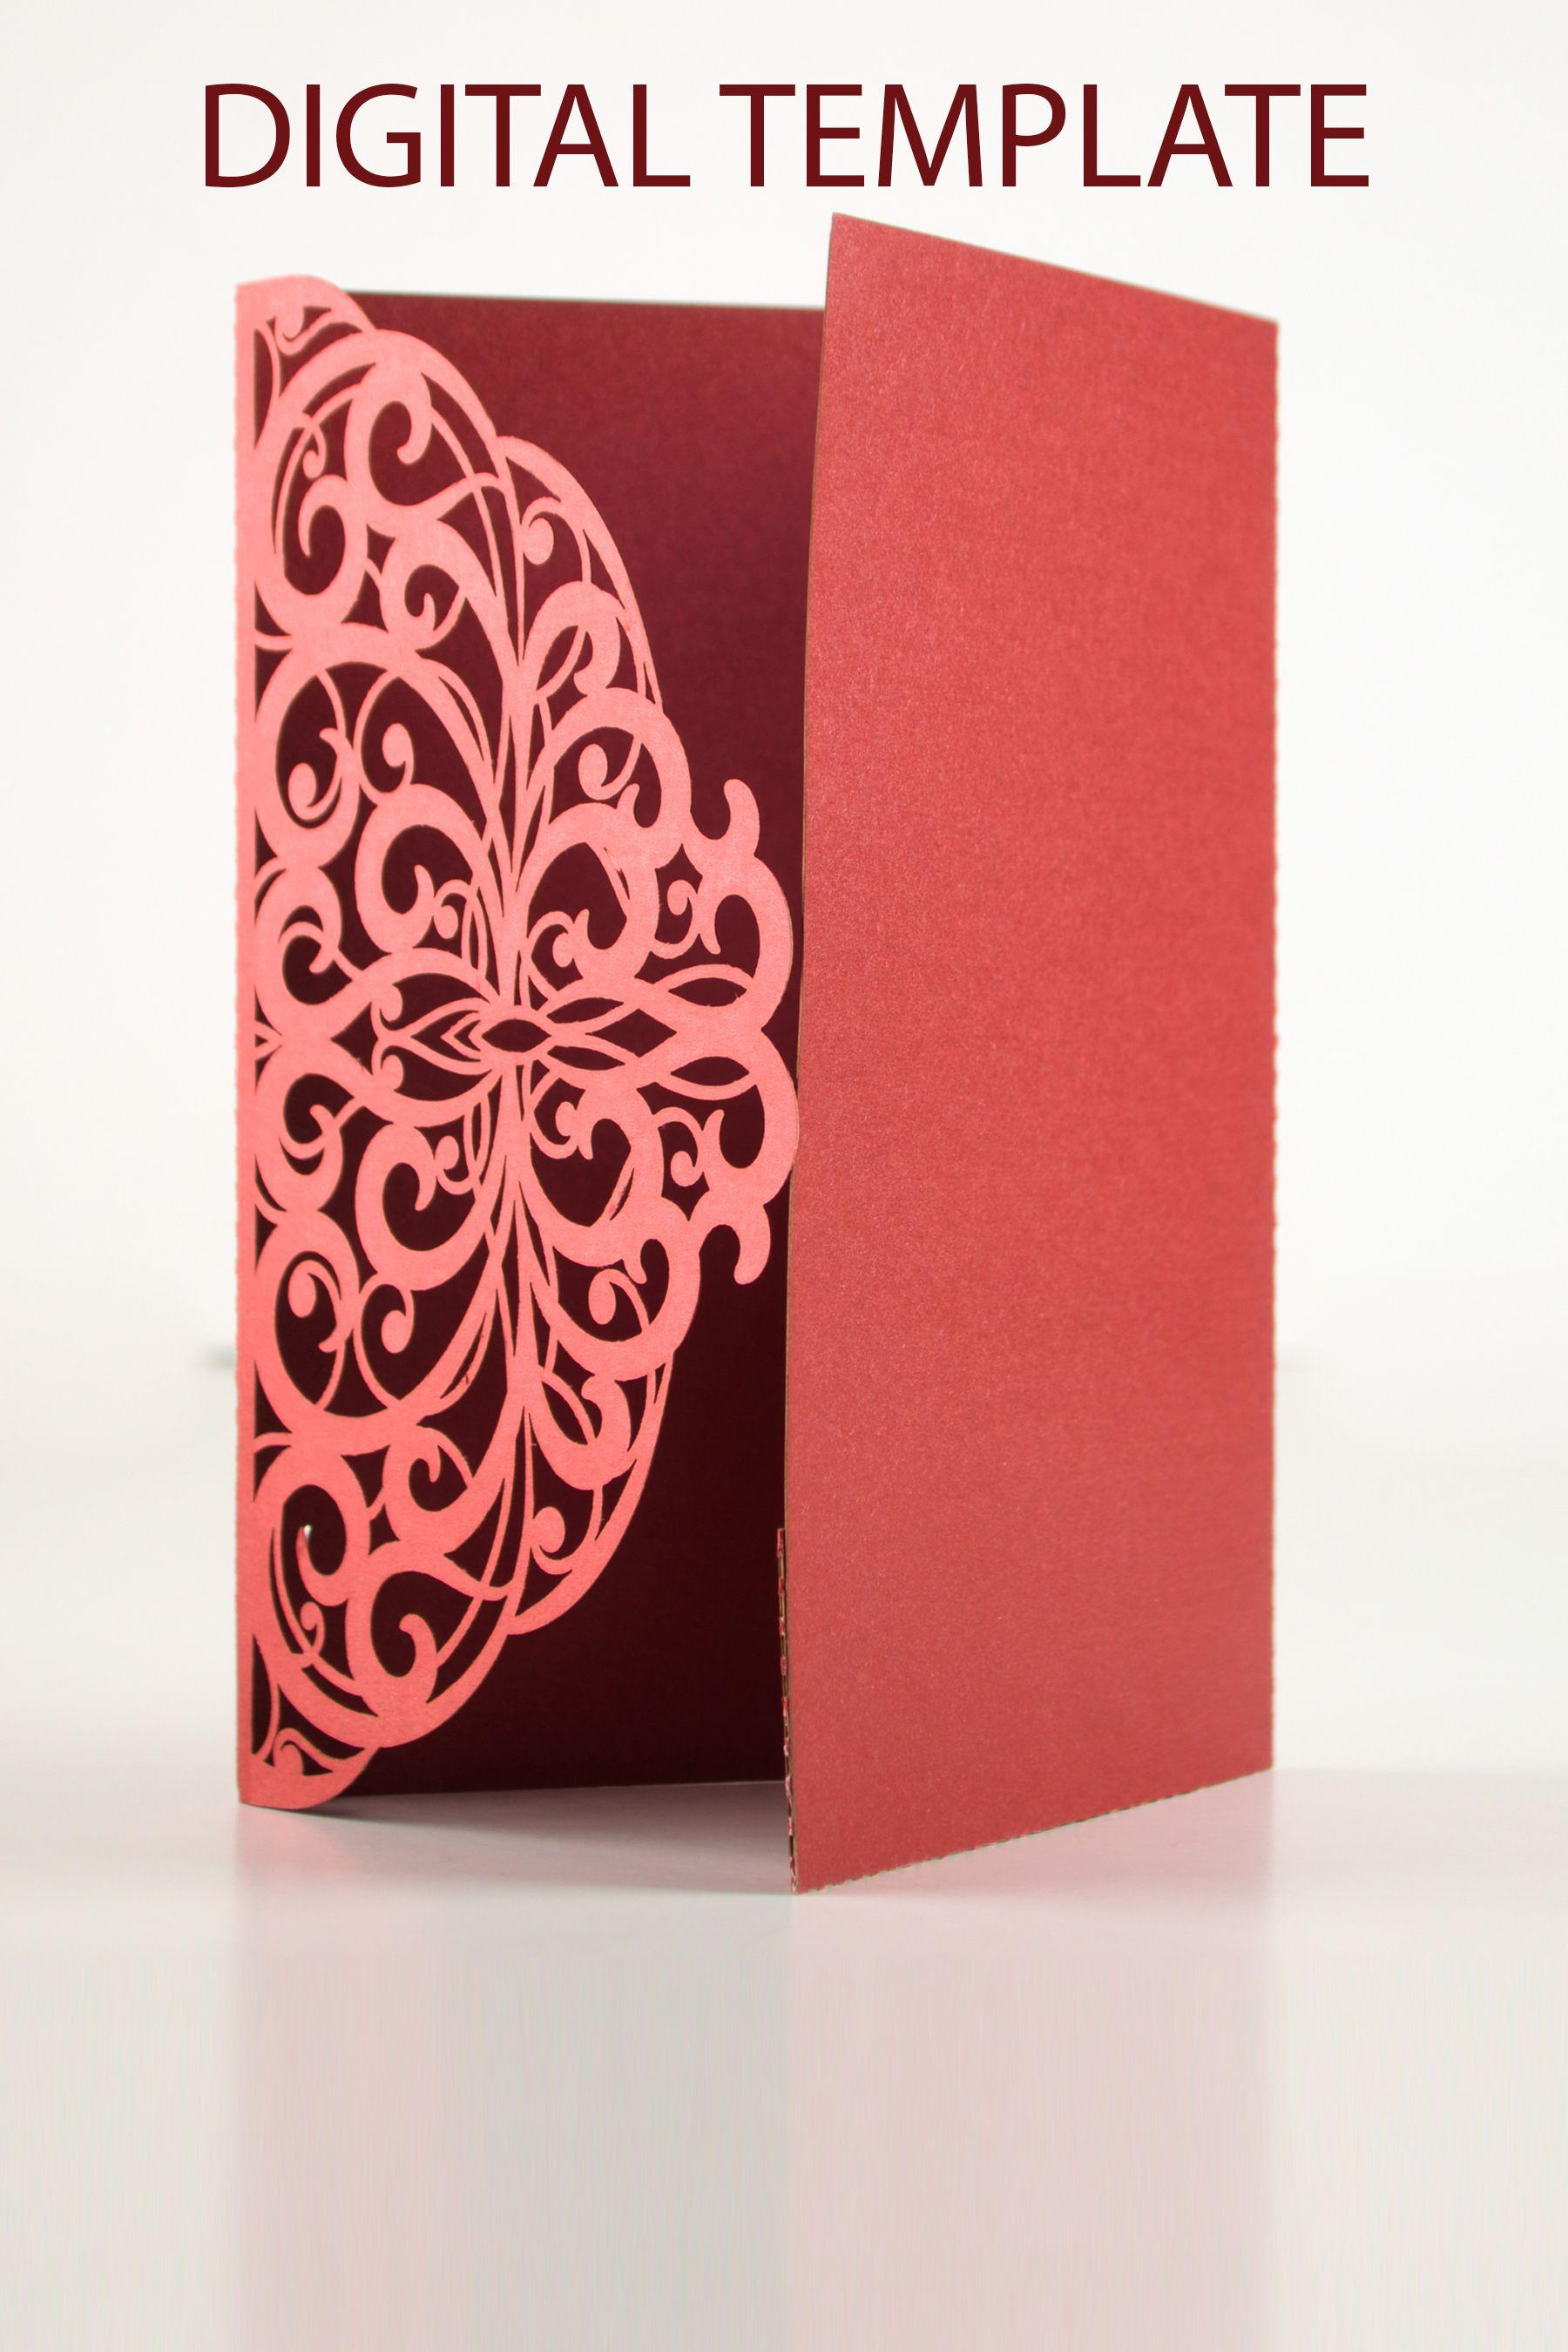 5x7 Pocket Fold Invitation Template